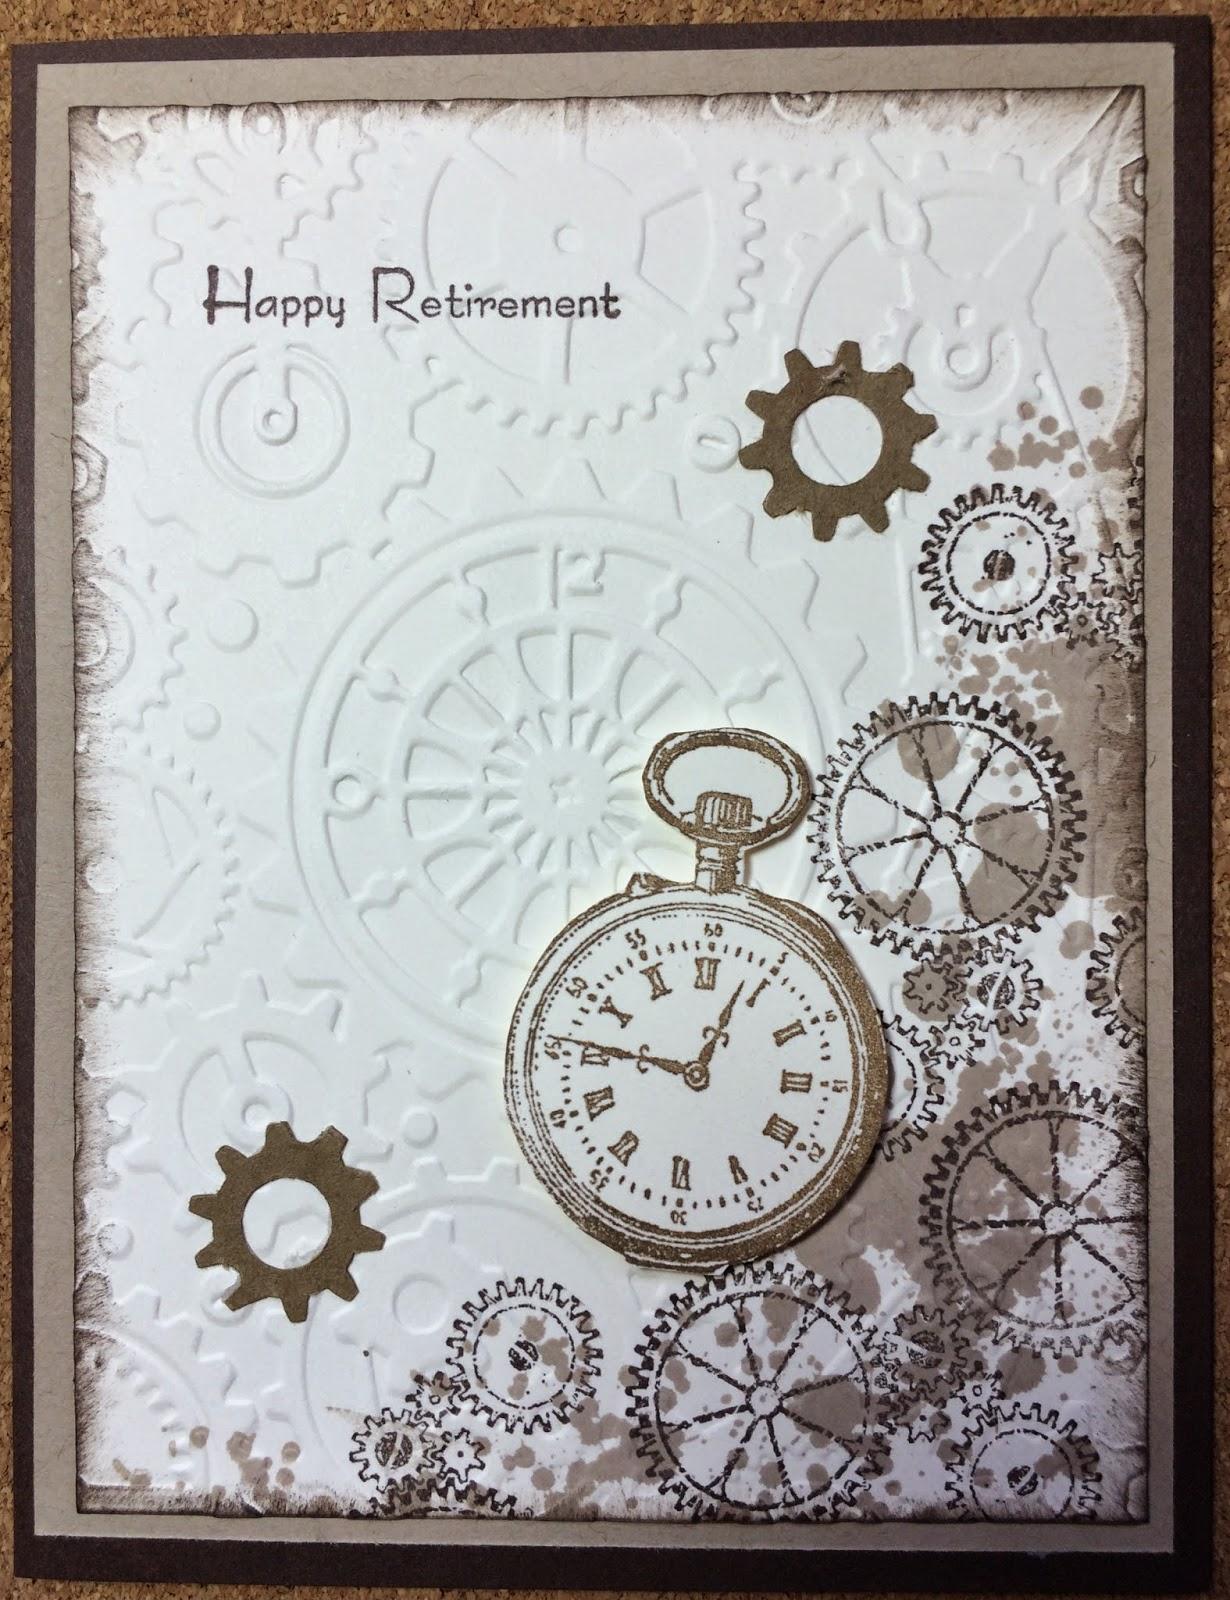 Handmade retirement tri-fold card | Retirement cards, Tri ... |Handmade Retirement Cards